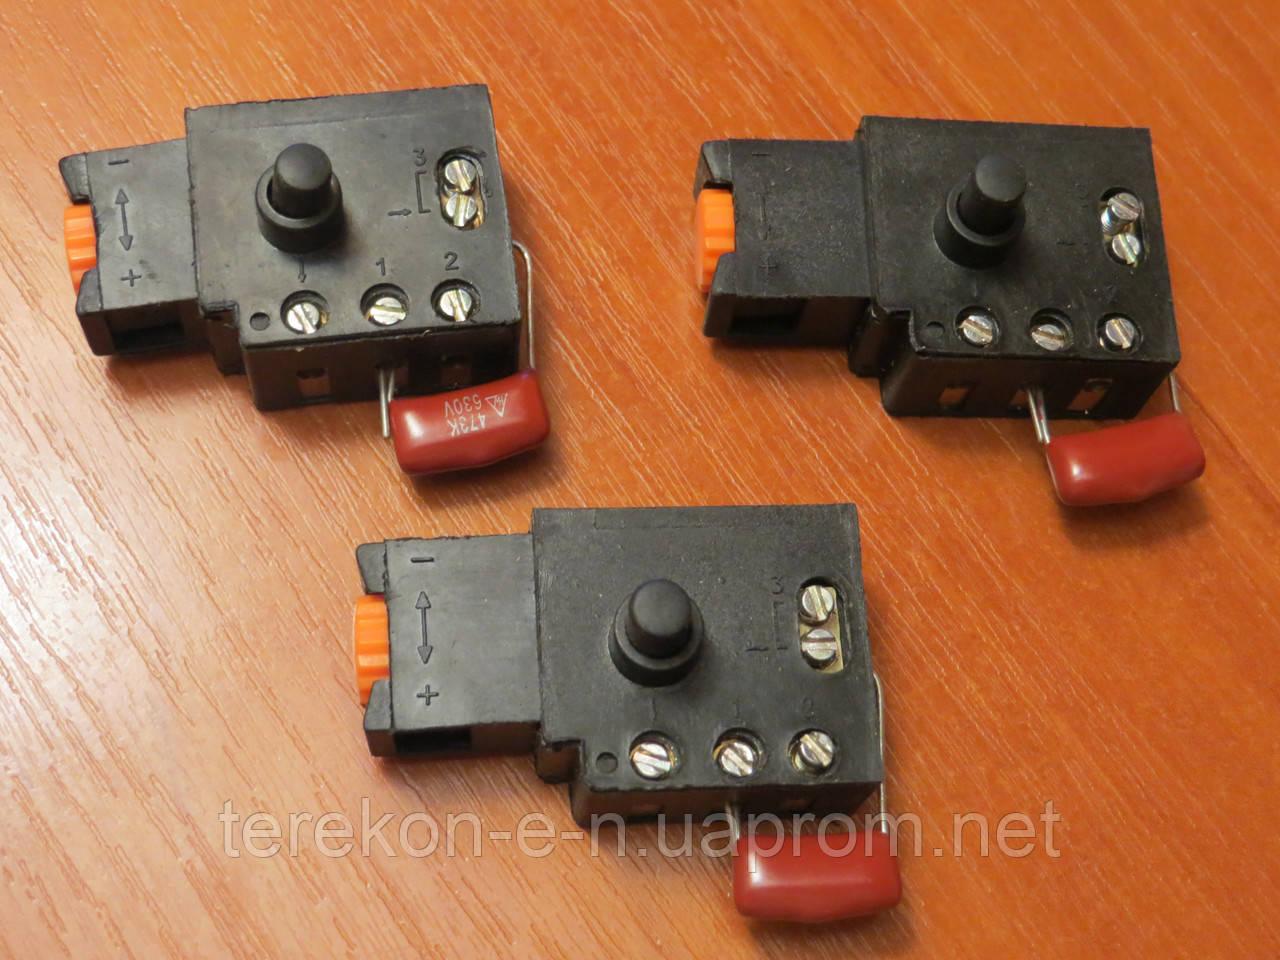 Кнопка с конденсатором на дрели